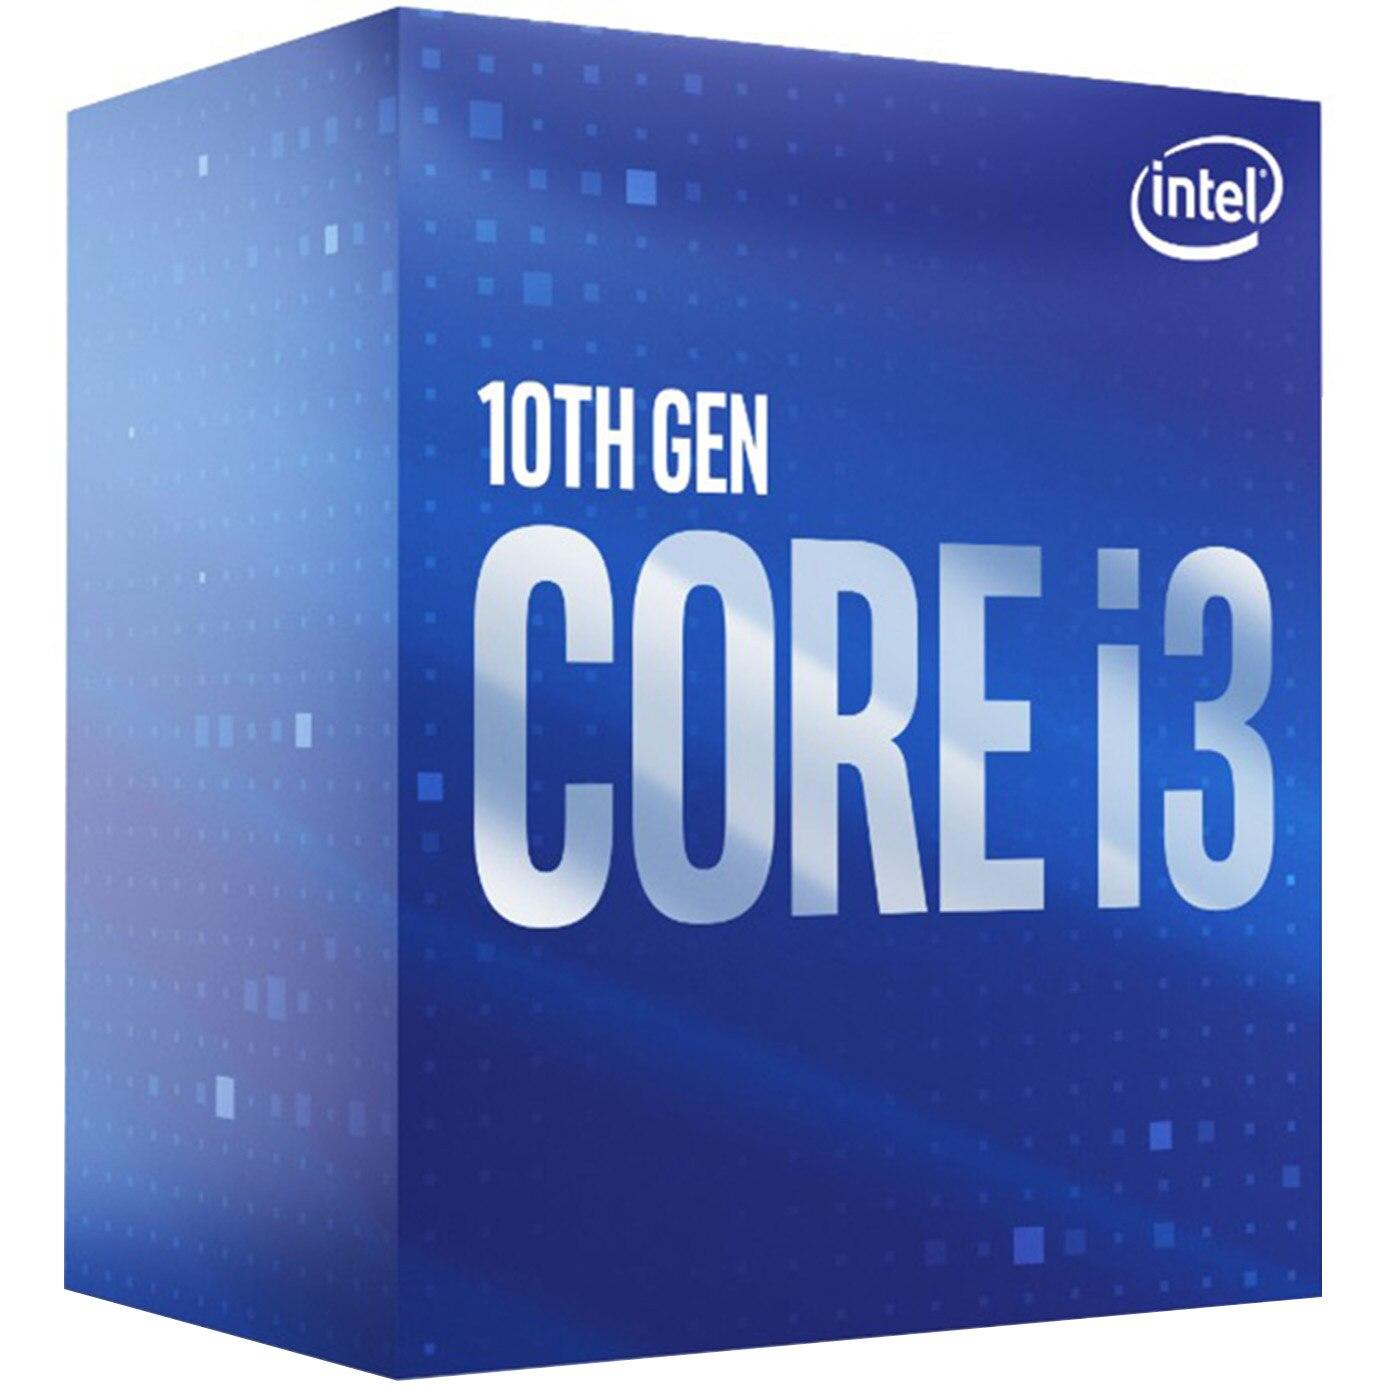 Fotografie Procesor Intel® Core™ i3-10300 Comet Lake, 3.7GHz, 8MB, Socket 1200